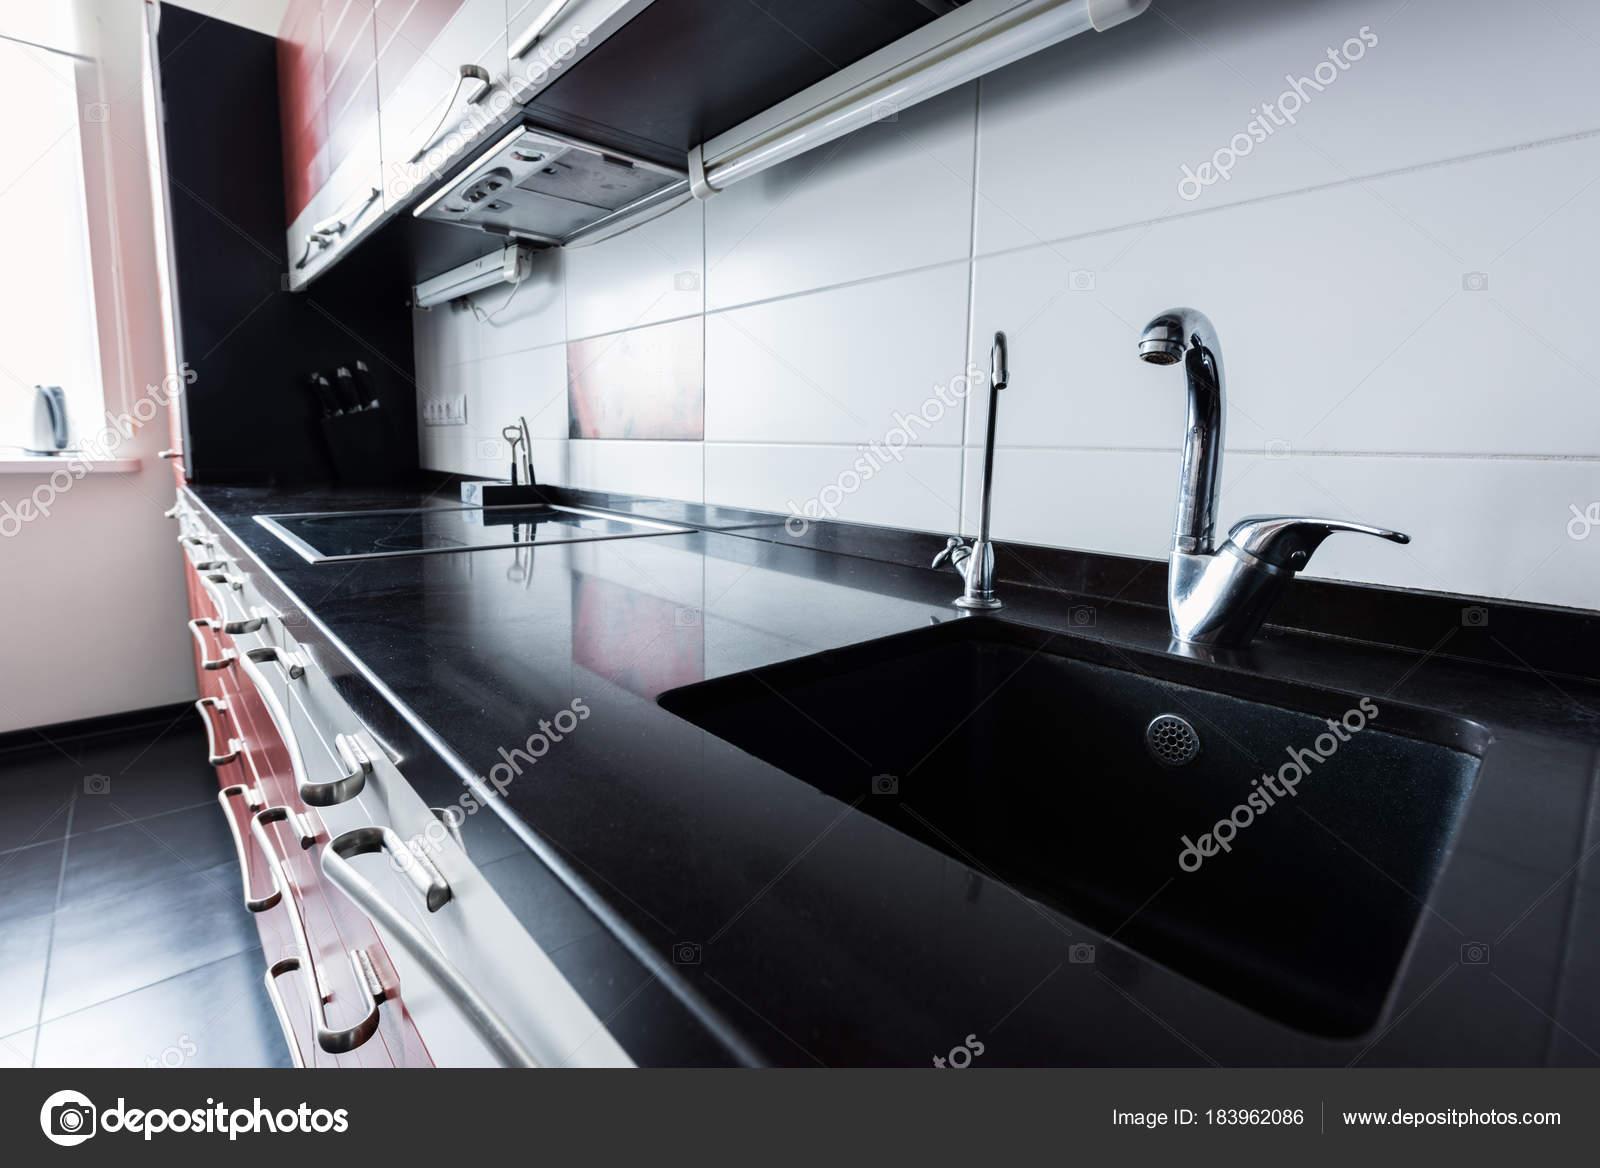 Close View Sink Faucets Kitchen — Stock Photo © Y-Boychenko #183962086